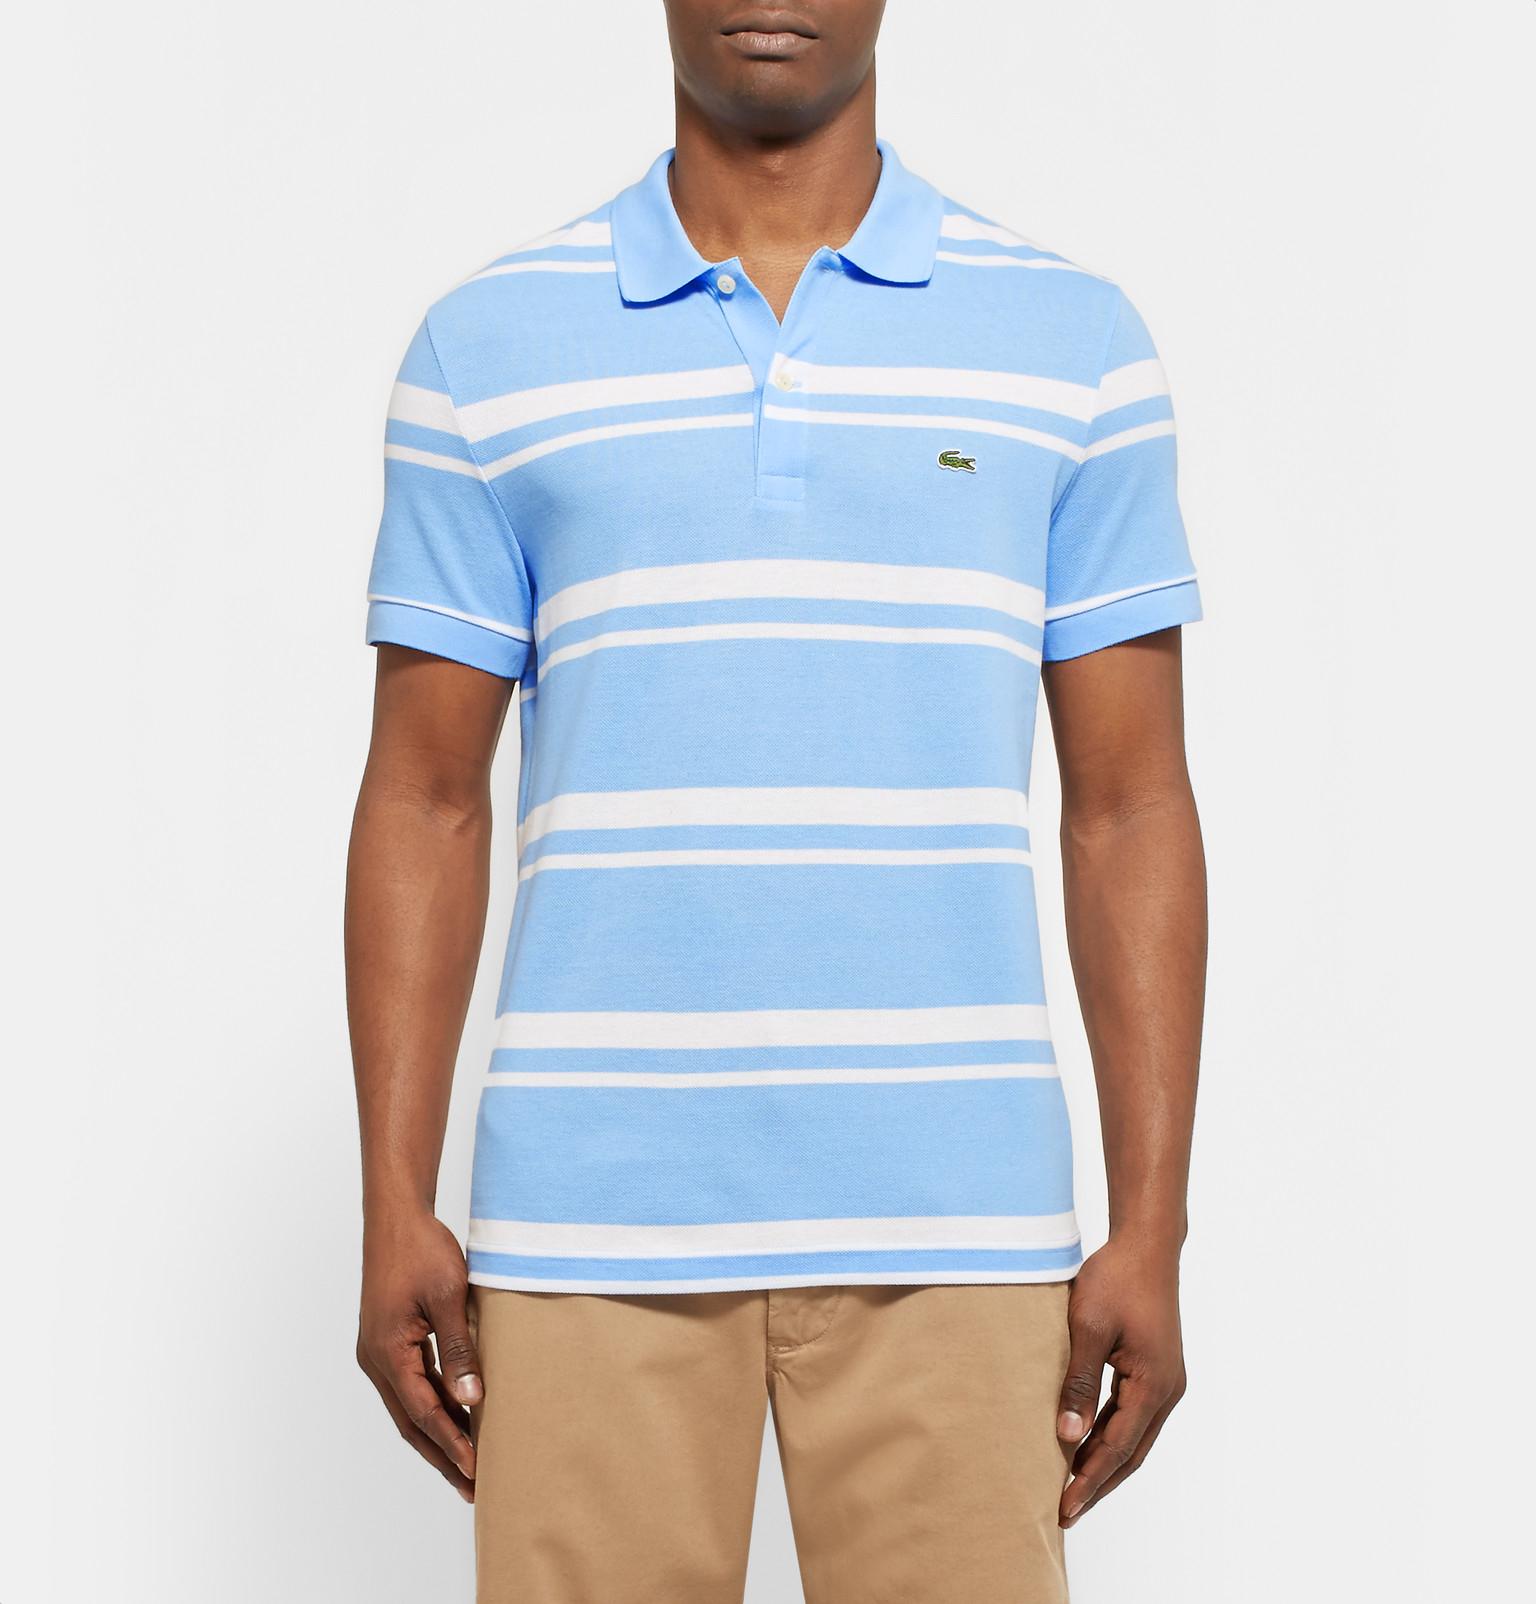 Lacoste Striped Cotton Piqu 233 Polo Shirt In Light Blue